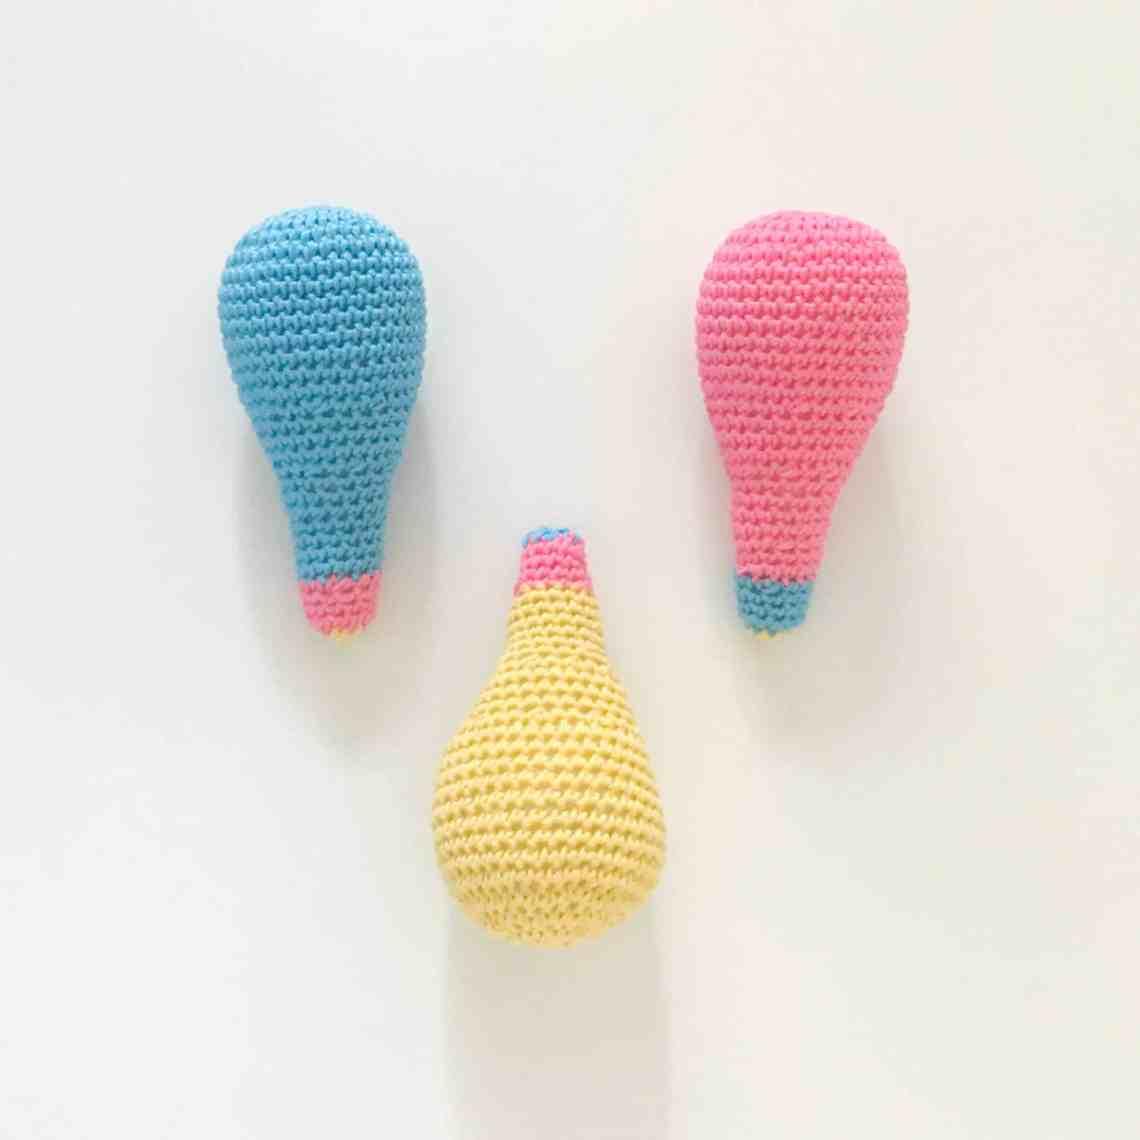 3 colourful crochet lightbulbs on a white background